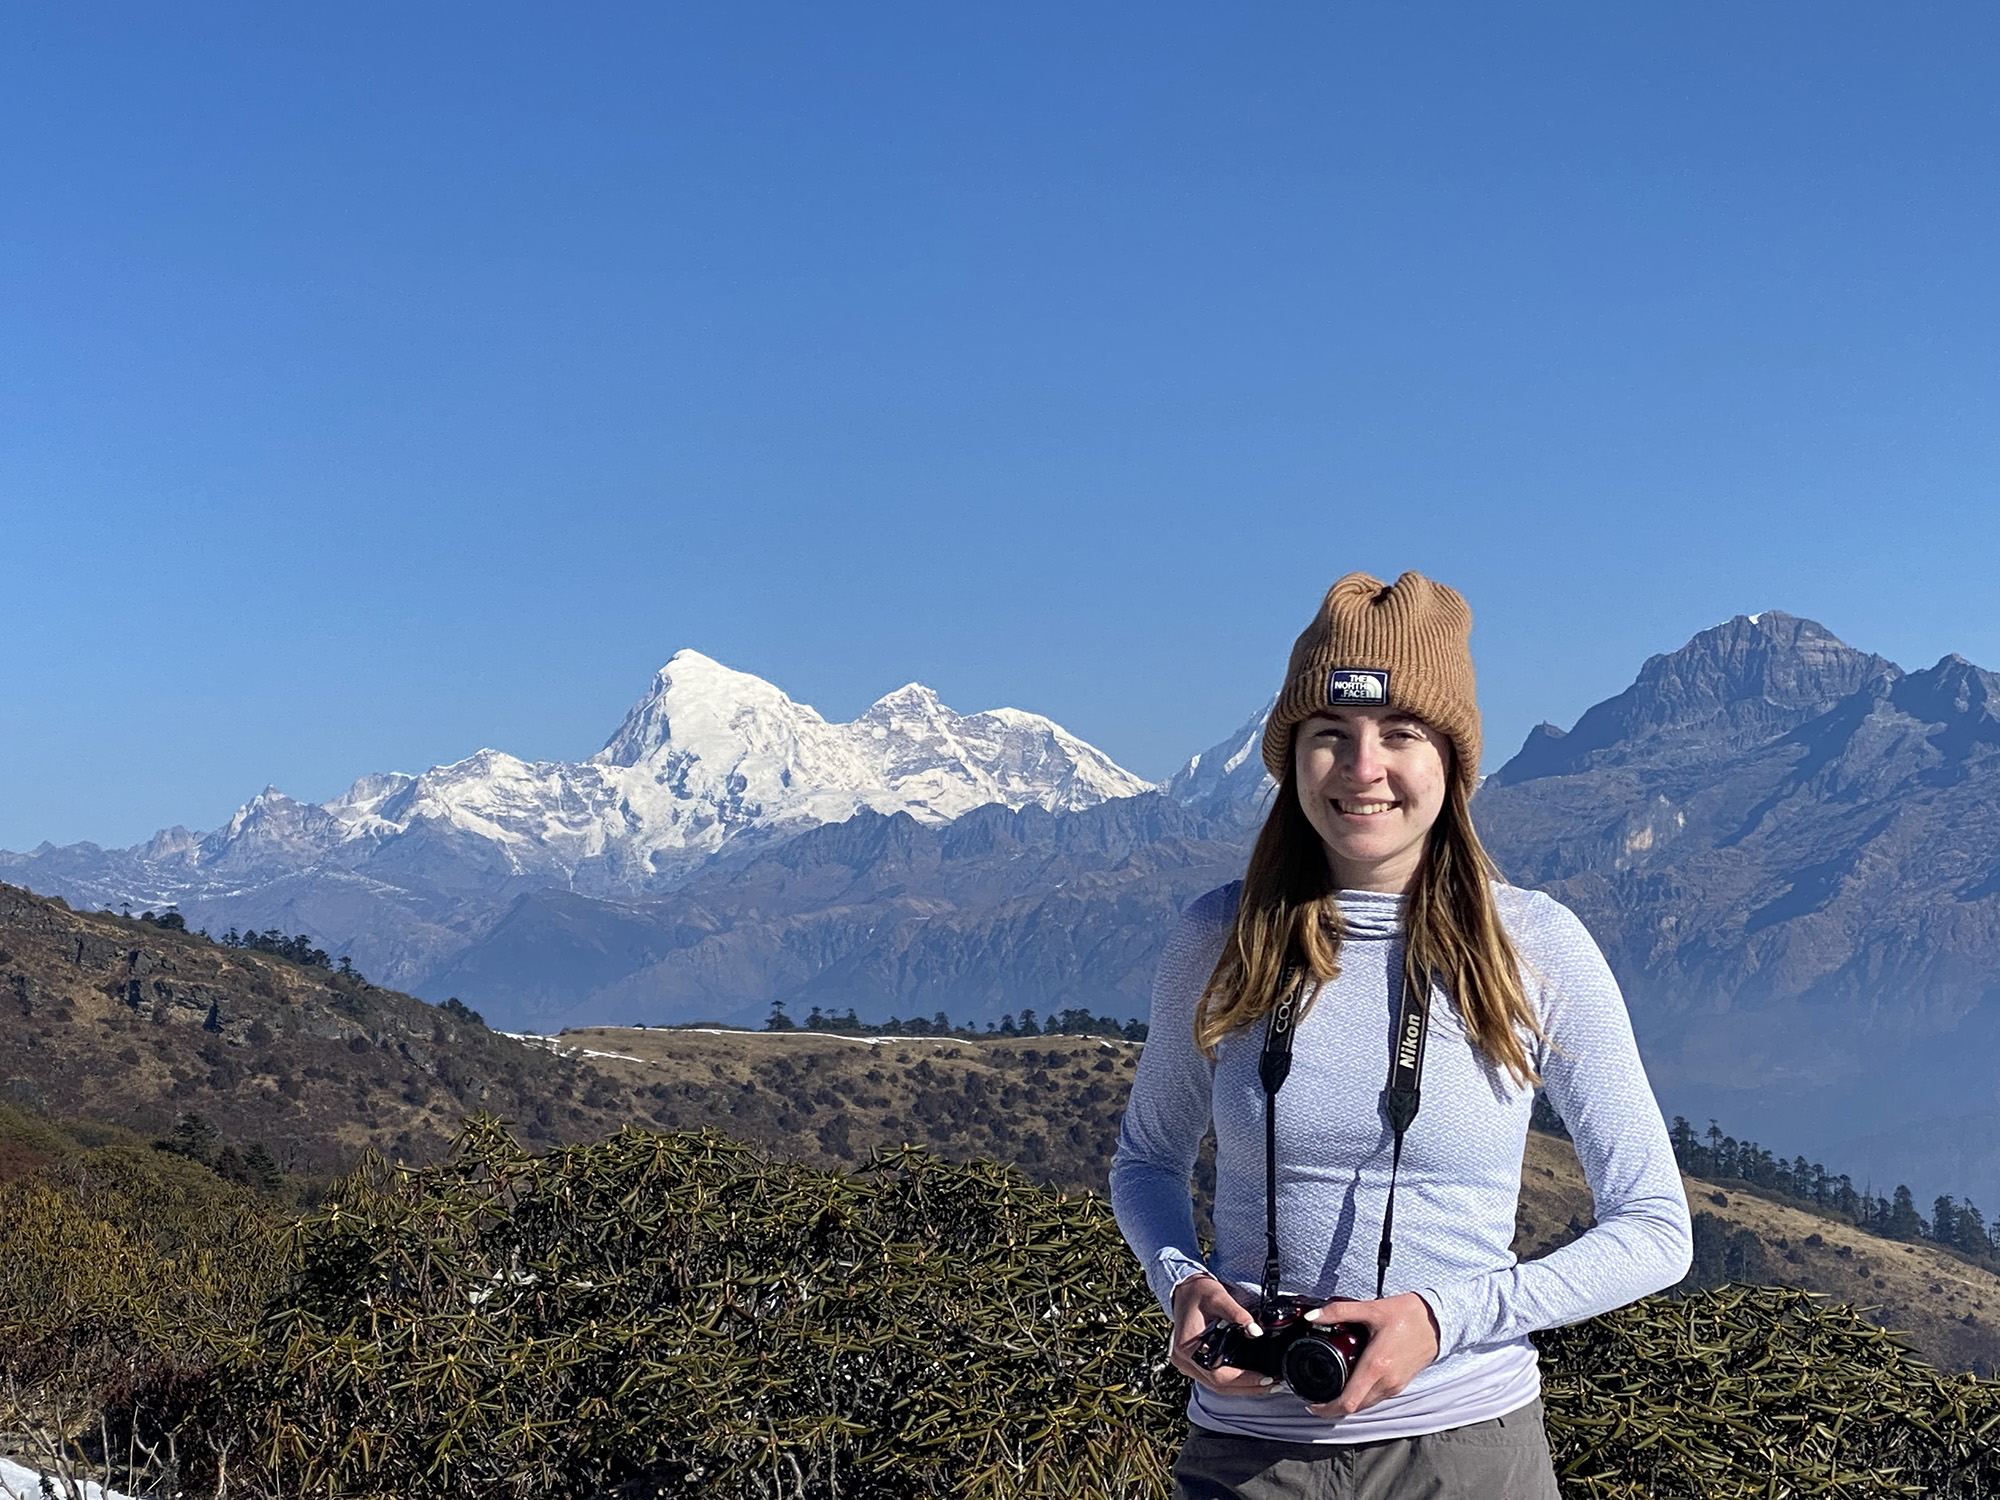 LSA senior Kayleigh Crabb in Paro, Bhutan. Image credit: Personal Archive